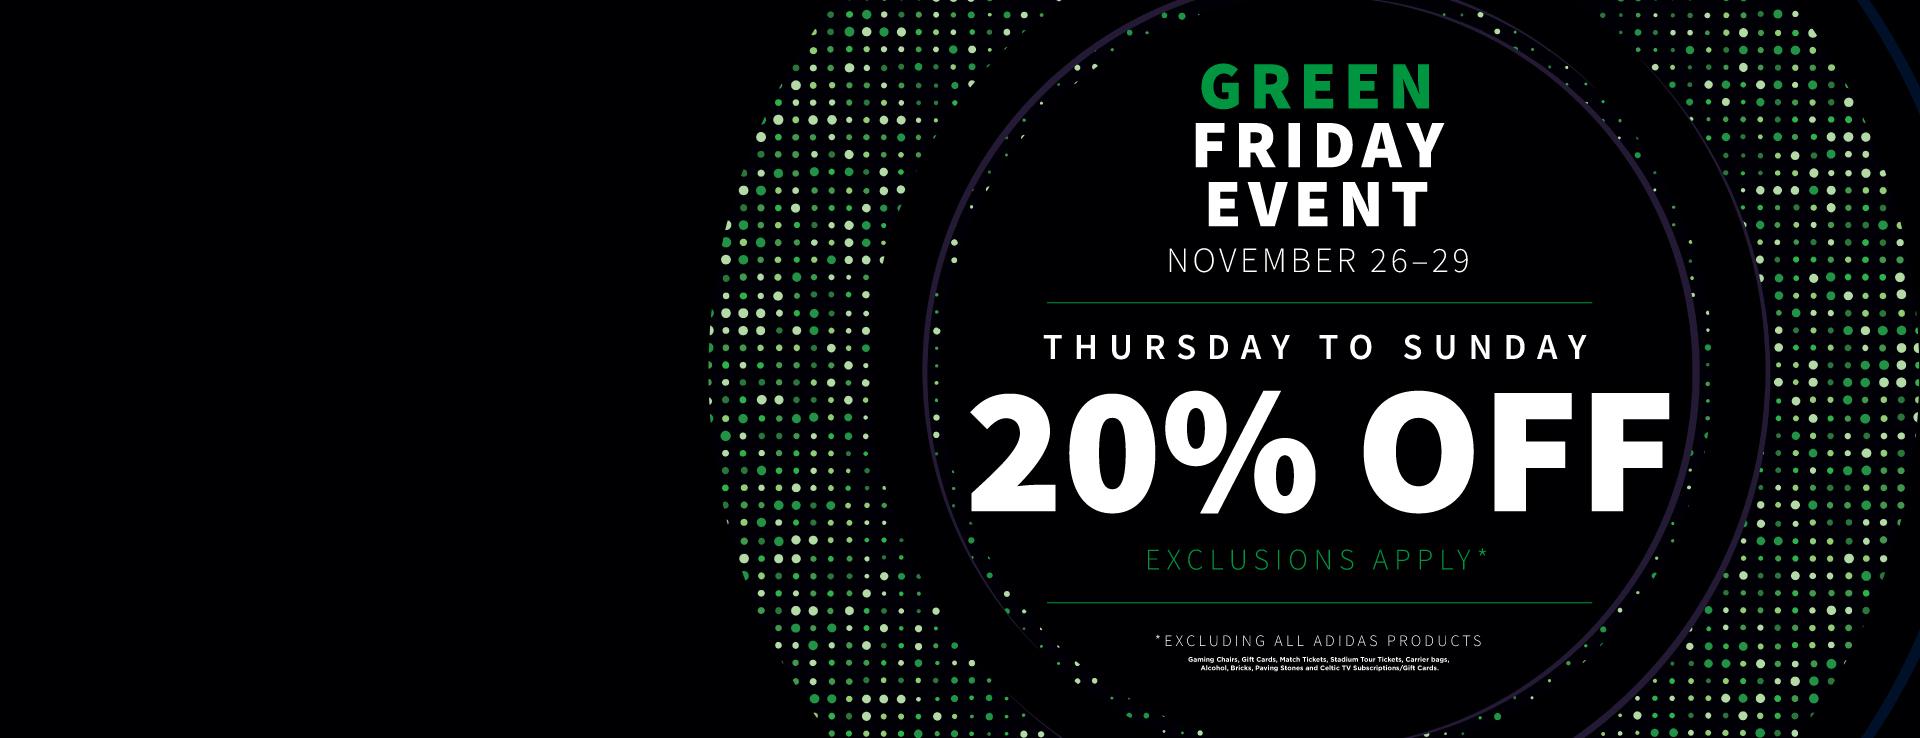 Green Friday Offer